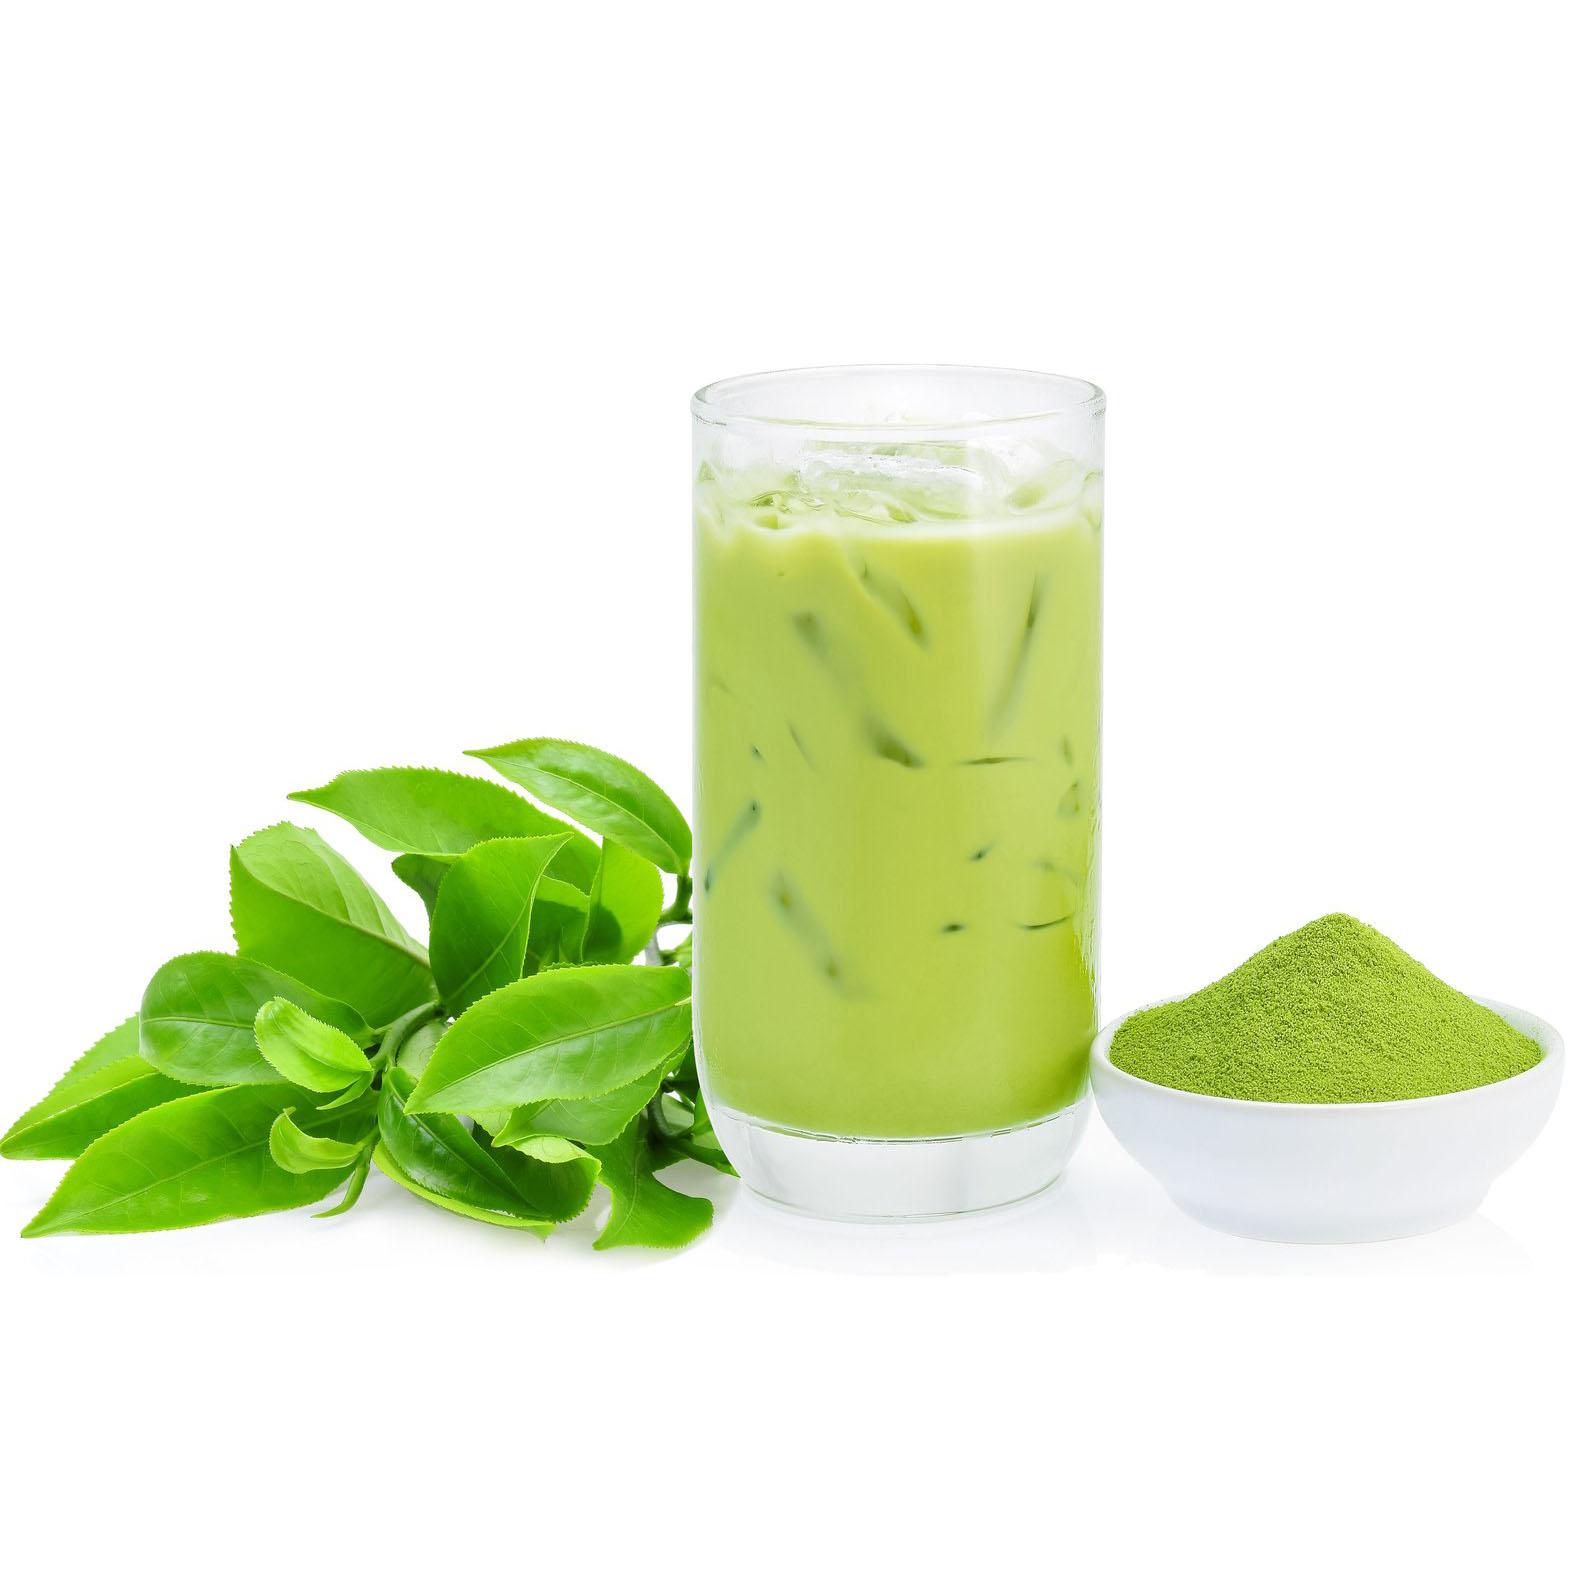 mocu-organic-matcha-green-tea-detail-2.jpg